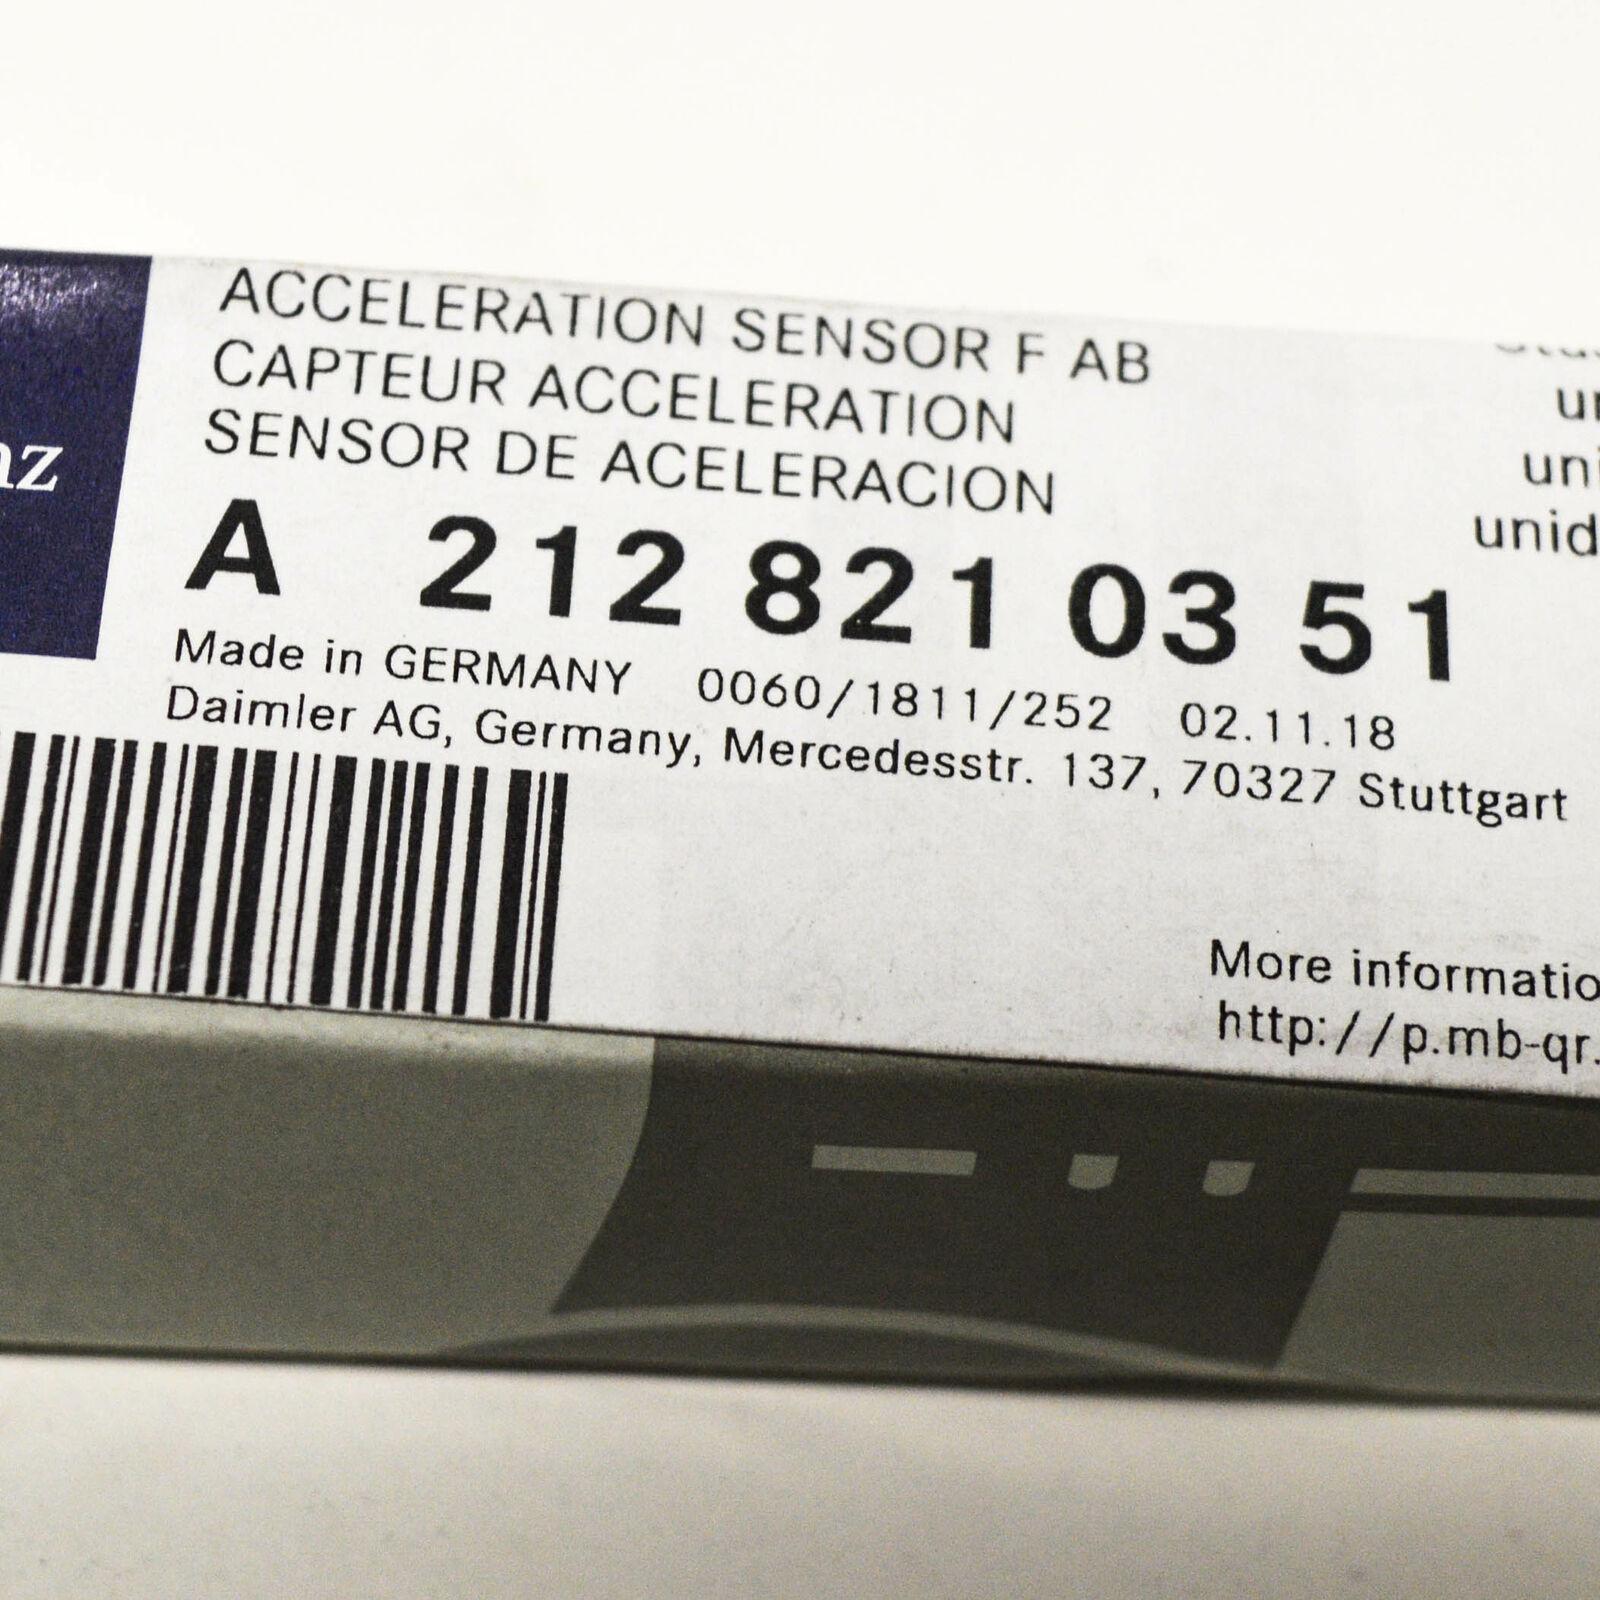 Original Mercedes a2128210351 Crash sensor sensor de aceleración